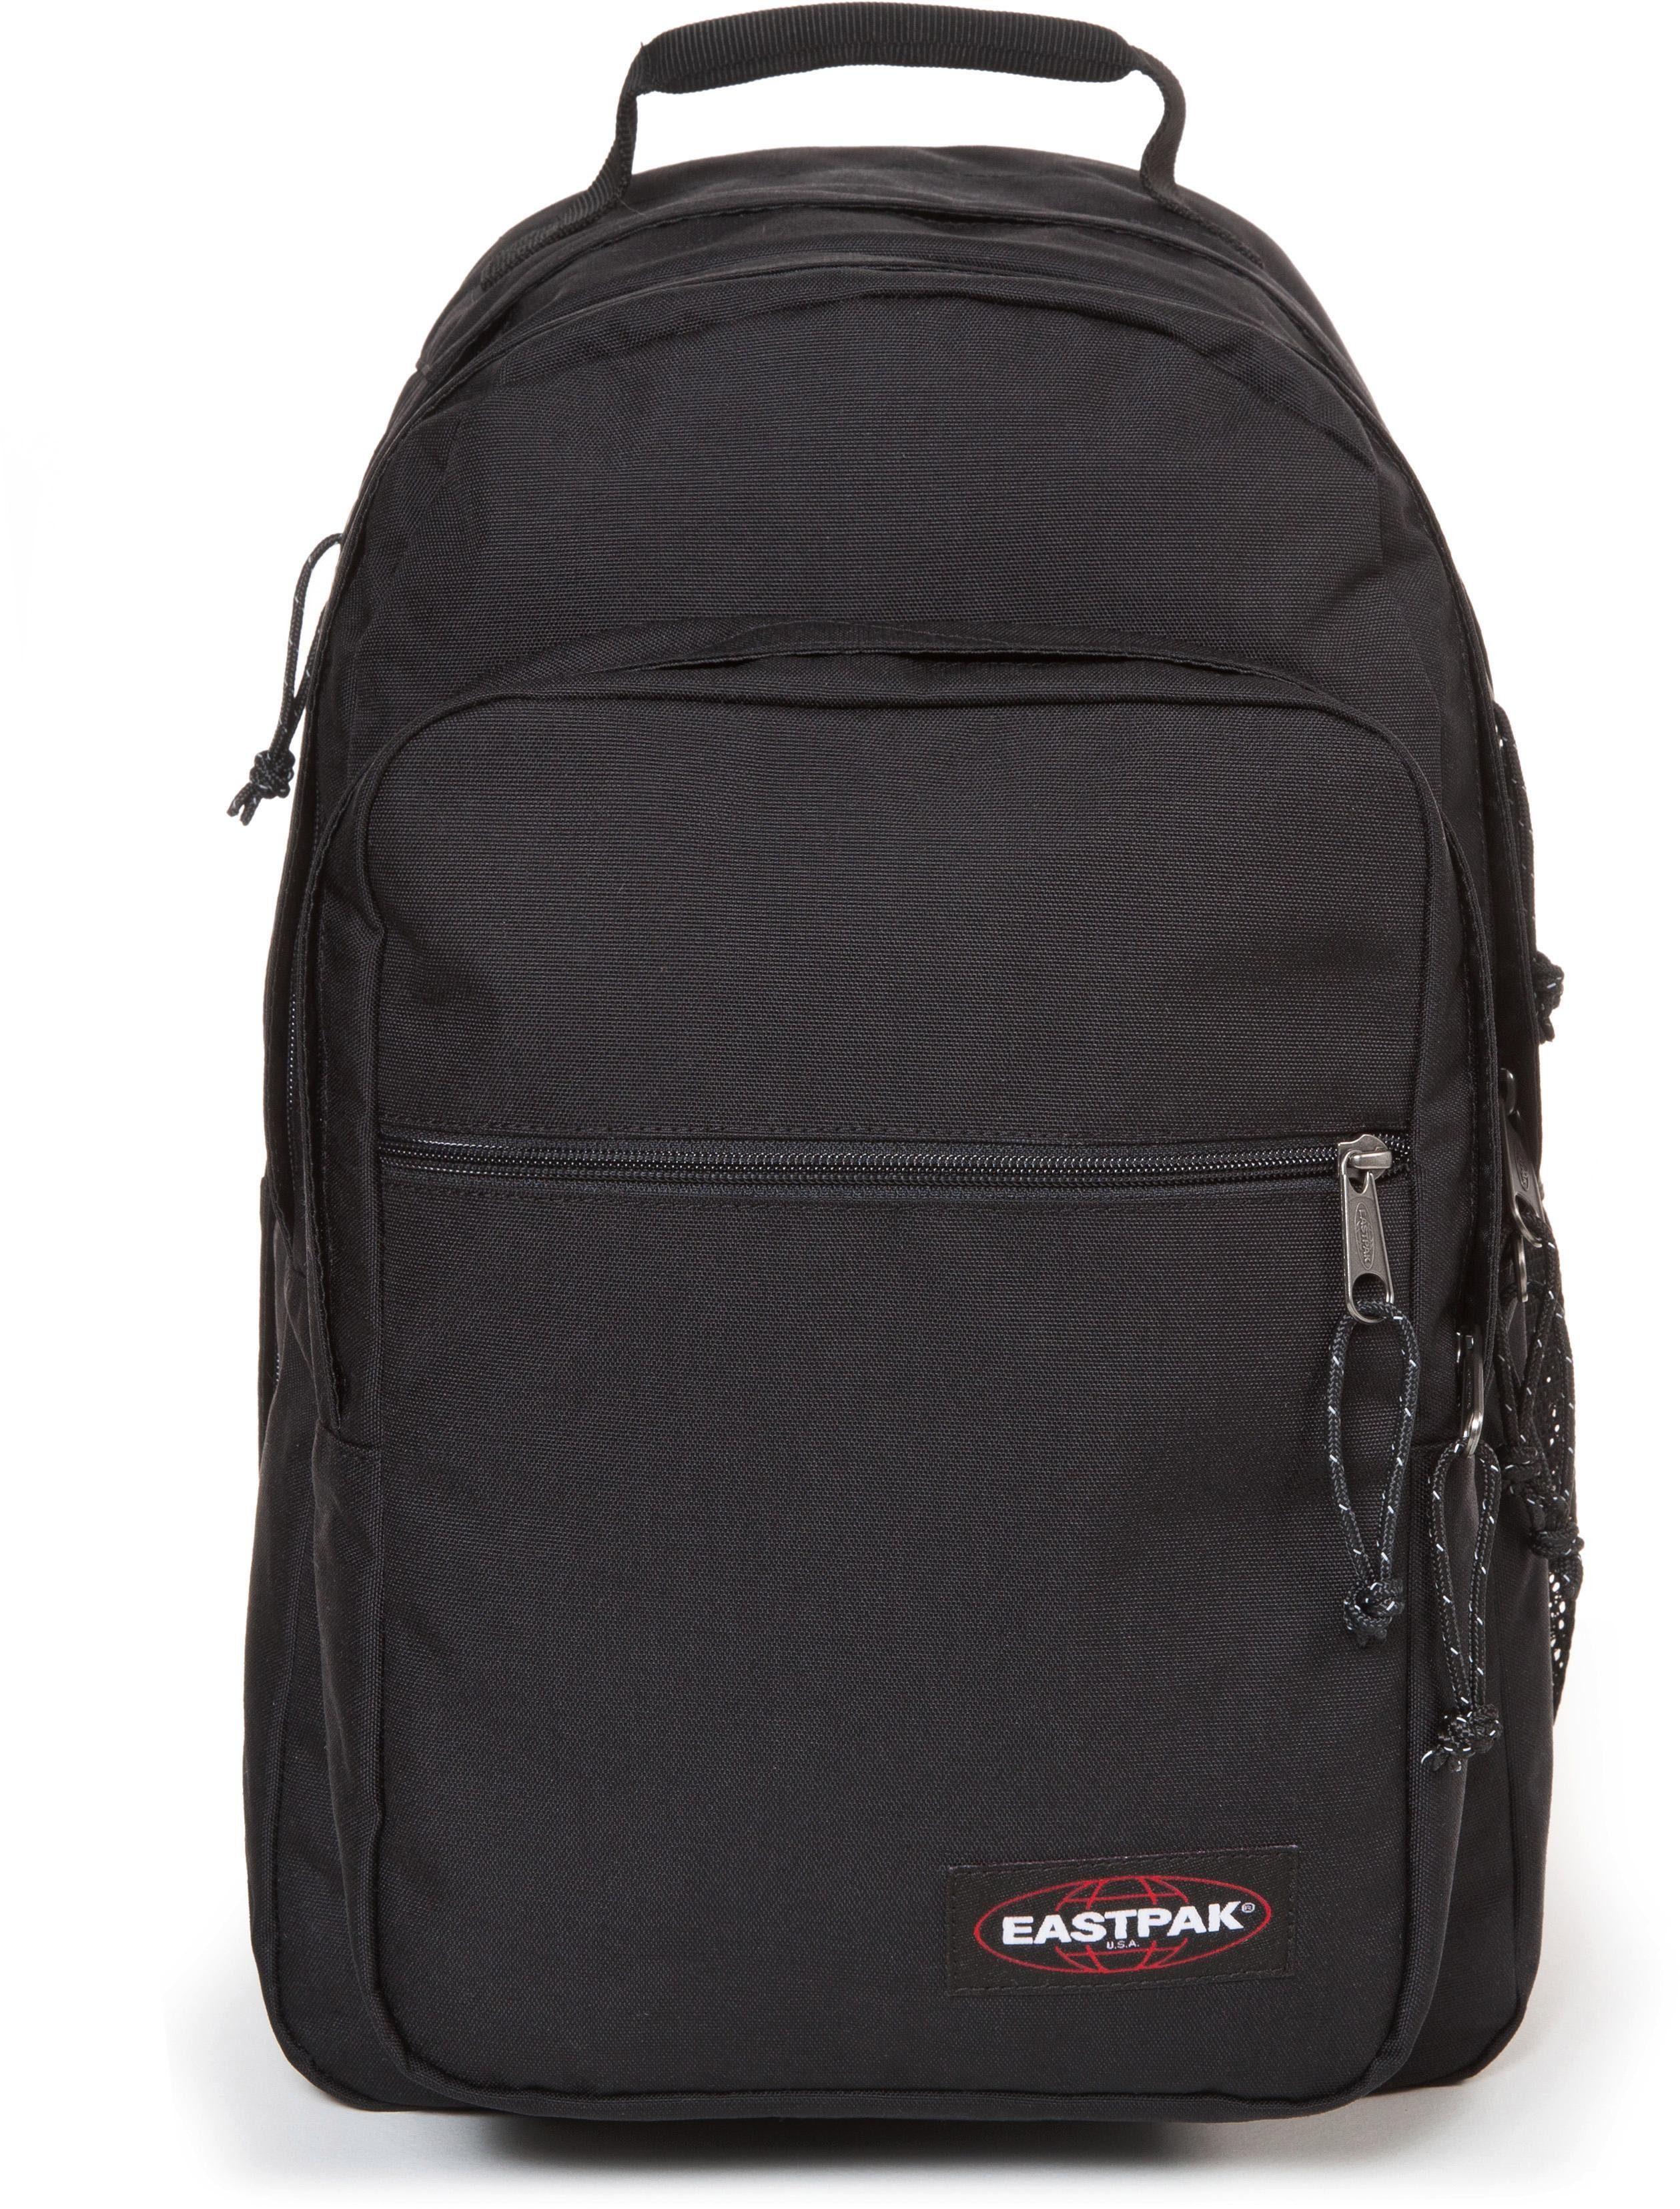 Eastpak Rucksack mit Laptopfach, »DARIAN black«